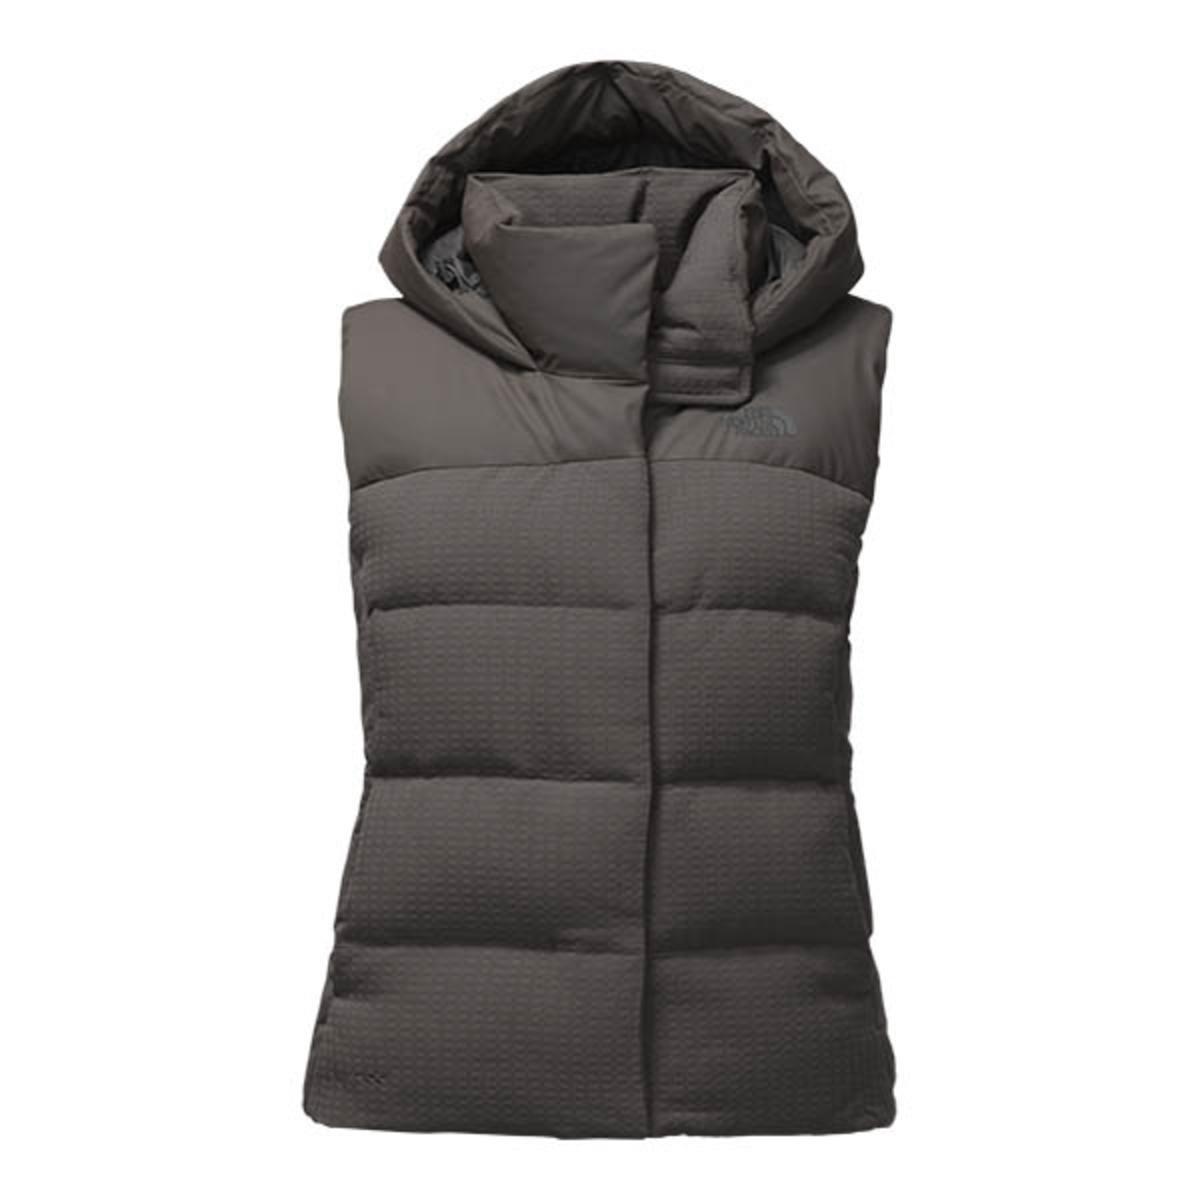 THE NORTH FACE Women's Nuptse Down Vest Black